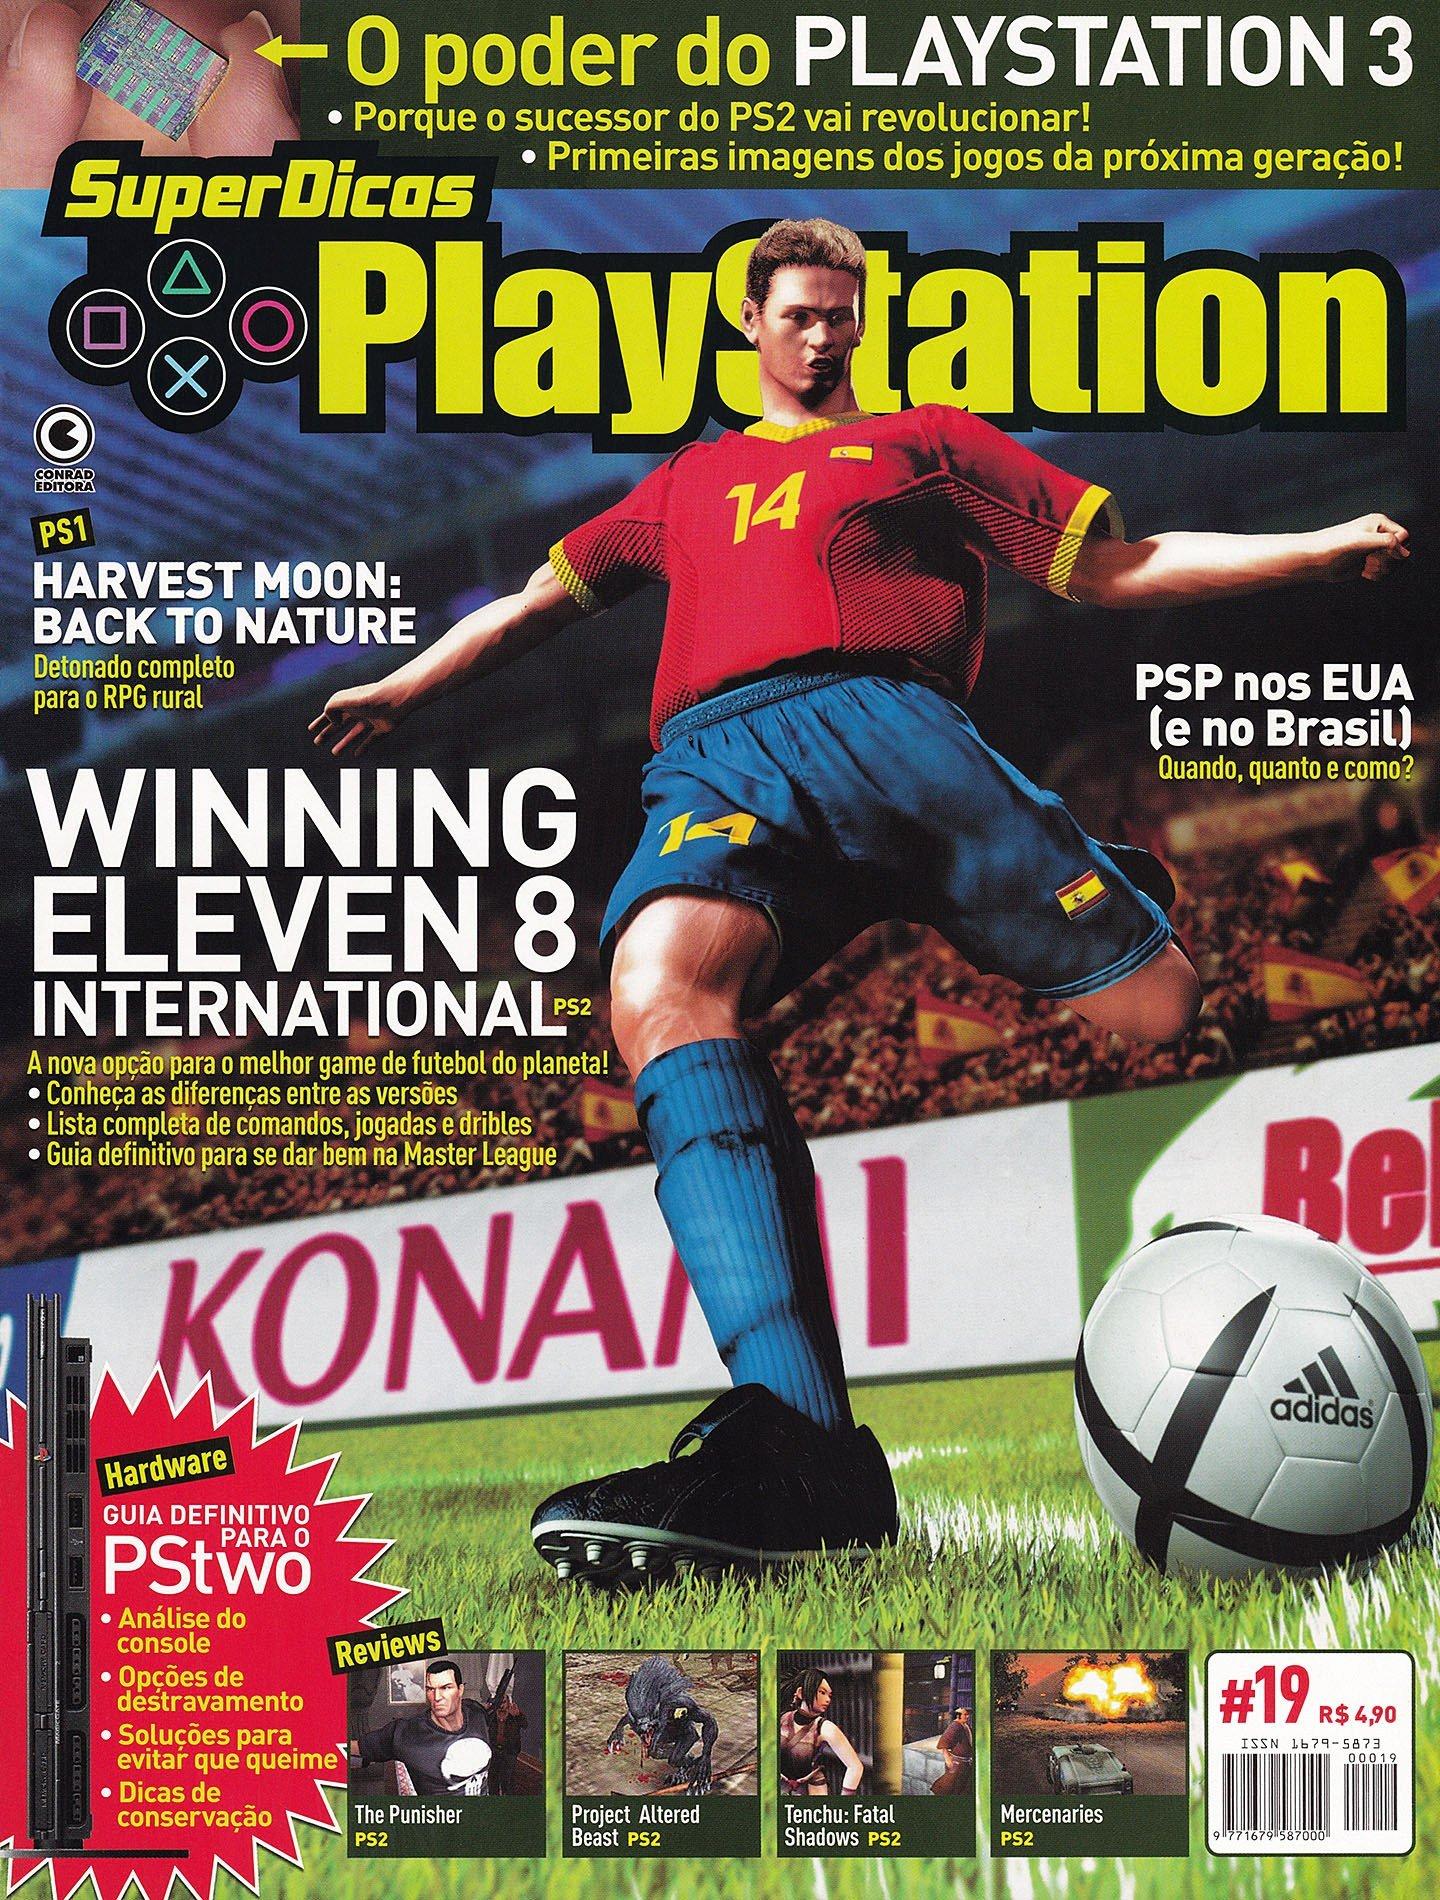 Super Dicas Playstation 19 (February 2005)